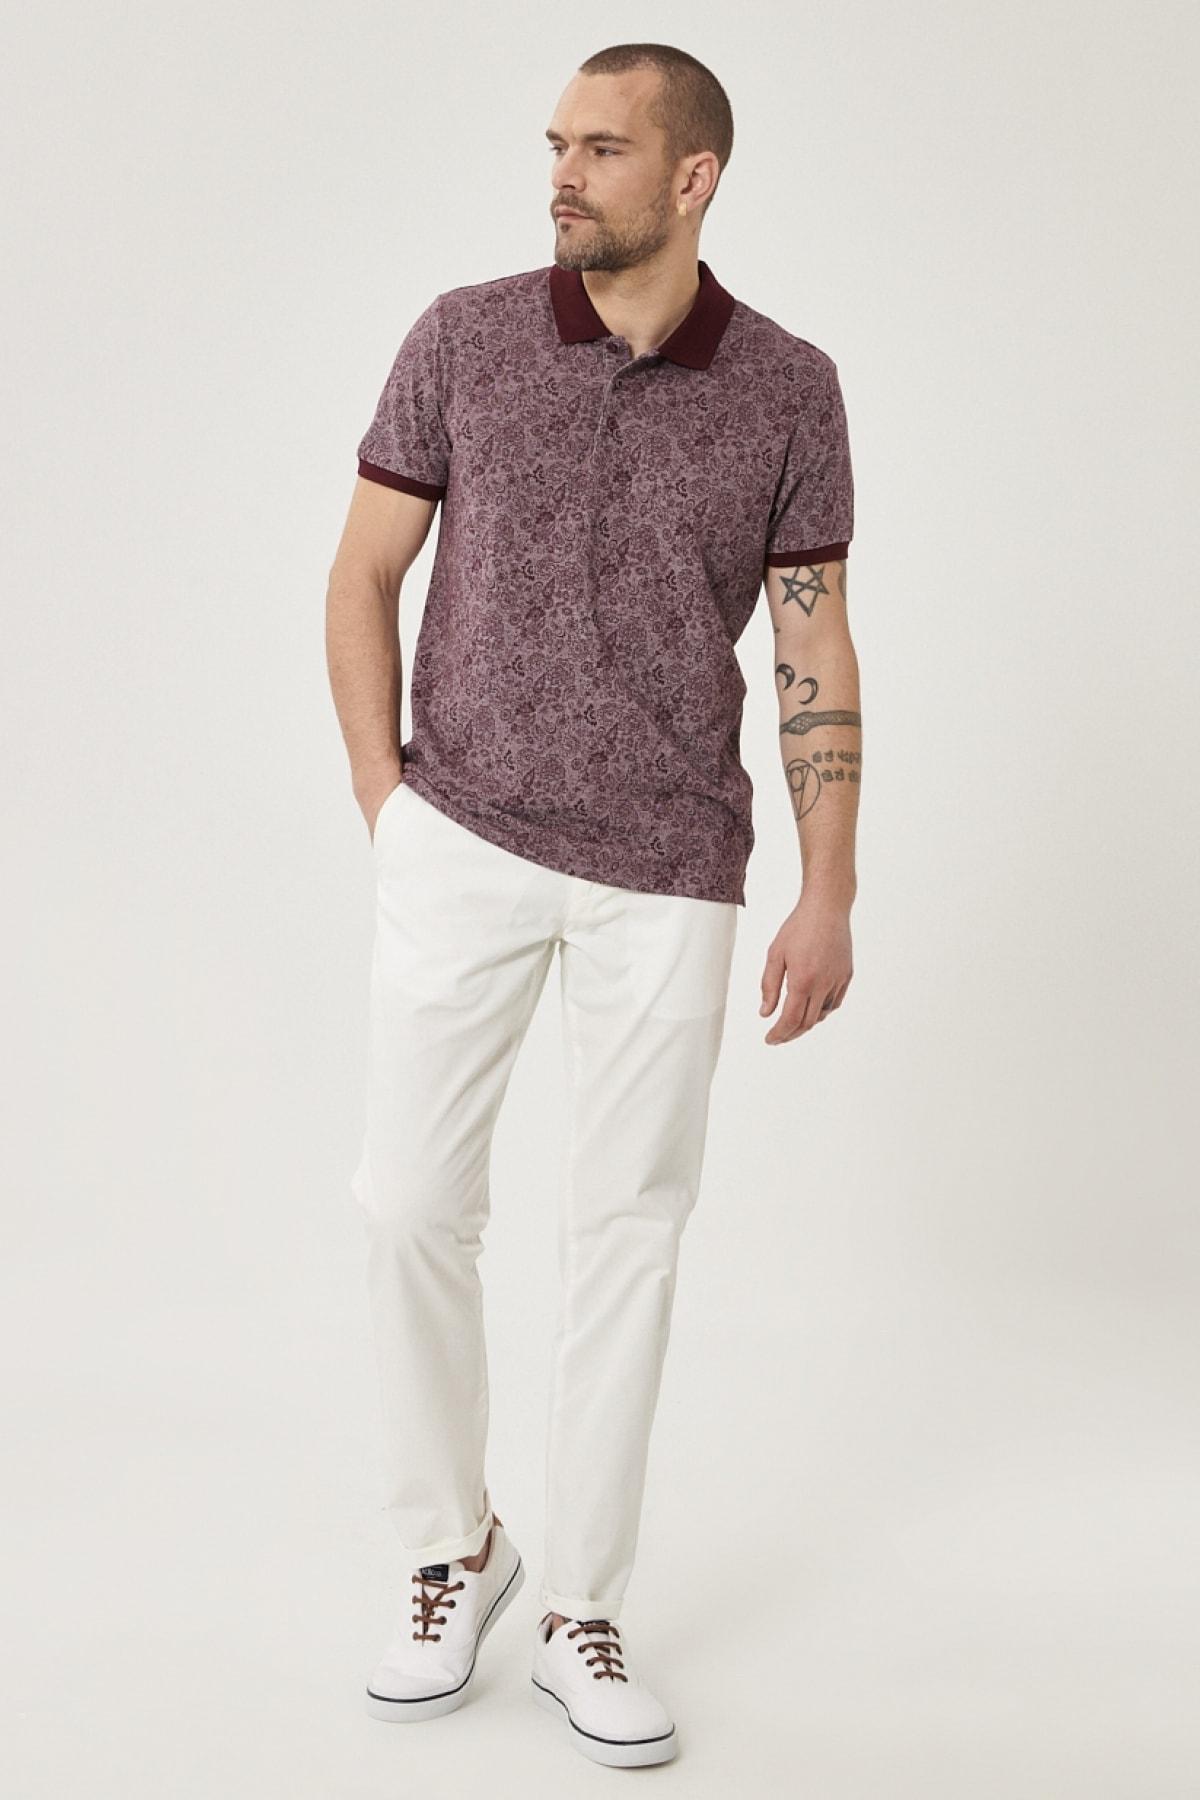 ALTINYILDIZ CLASSICS Erkek Beyaz Kanvas Slim Fit Chino Pantolon 2